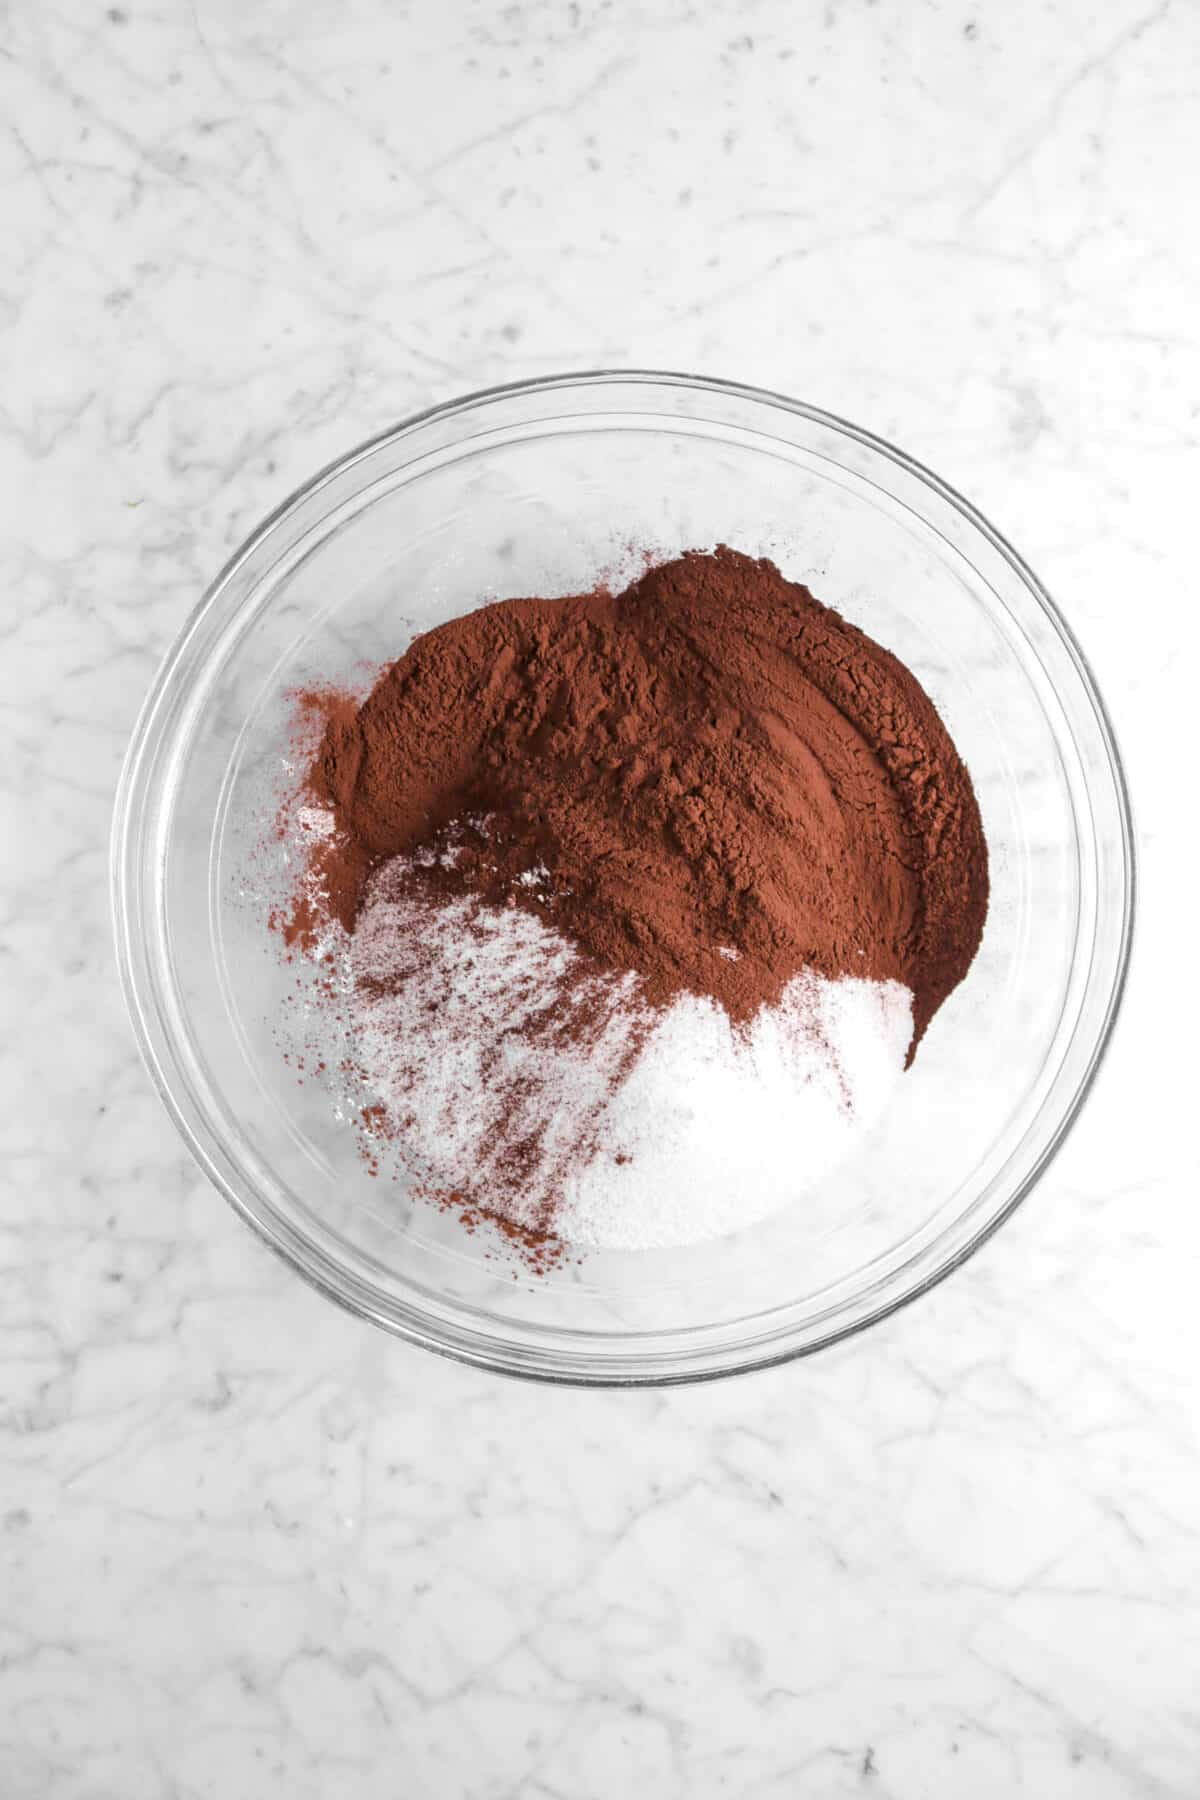 sugar, flour, and cocoa powder in glass bowl